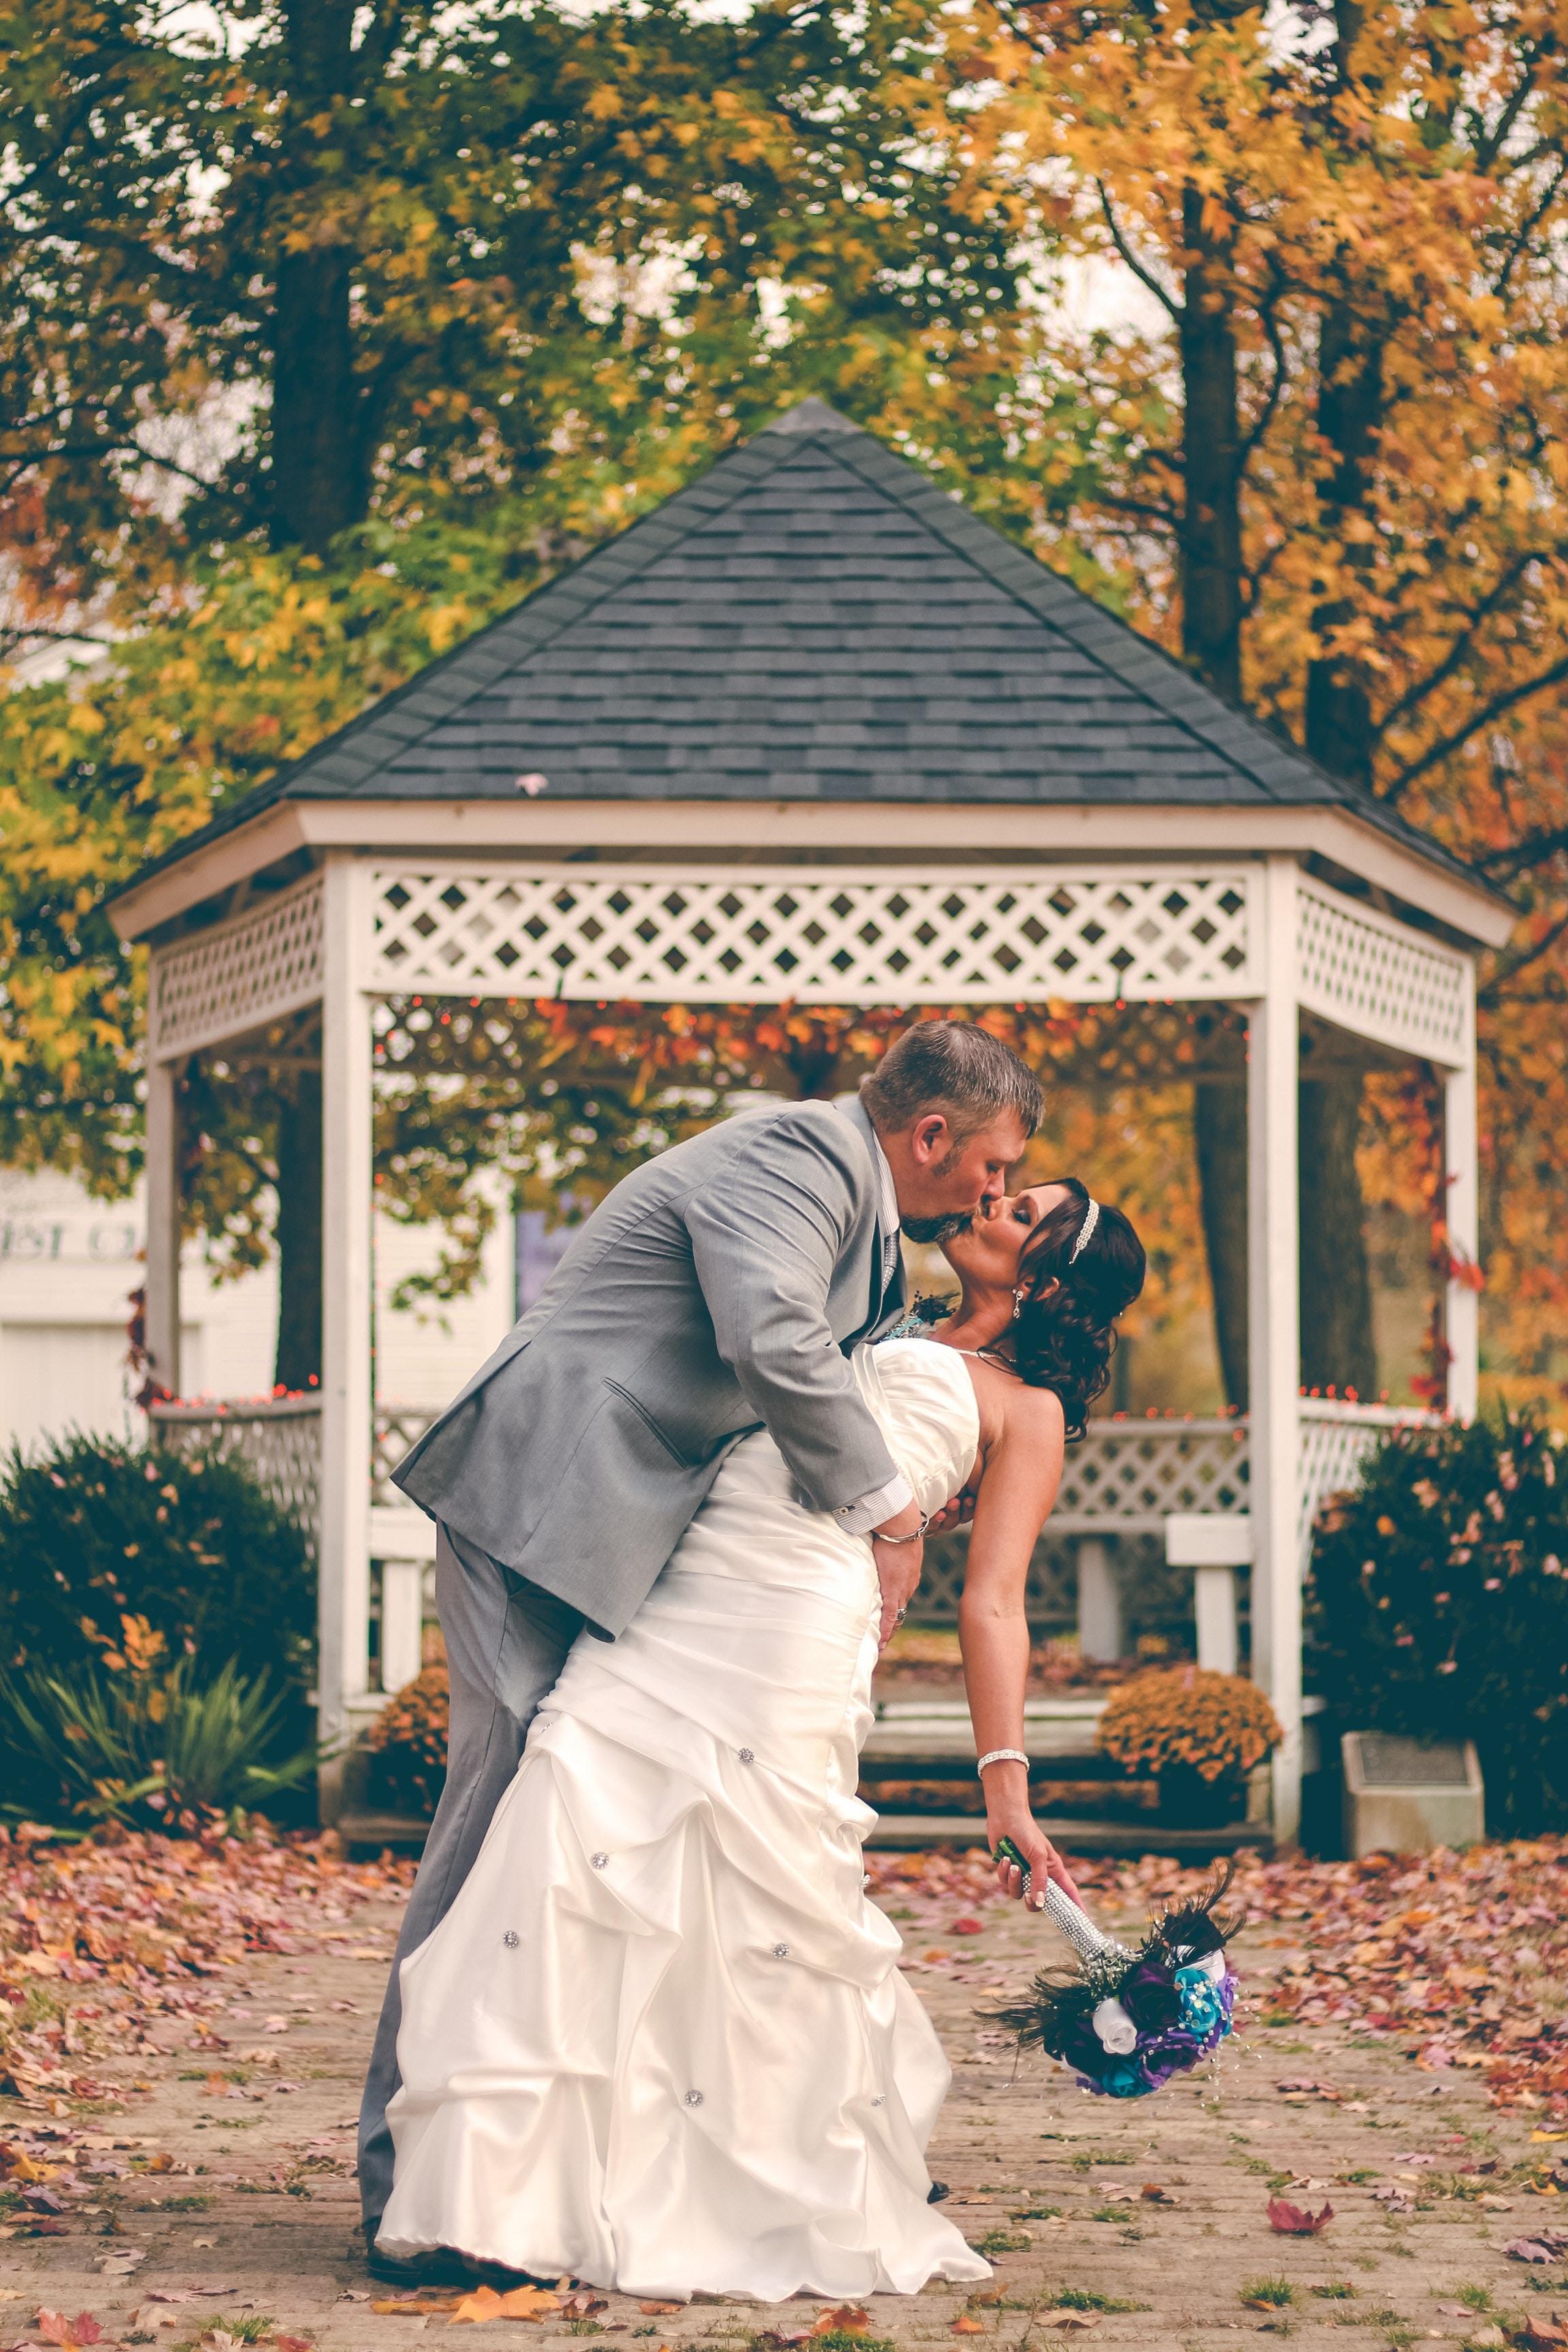 Fall photos fall wedding kiss